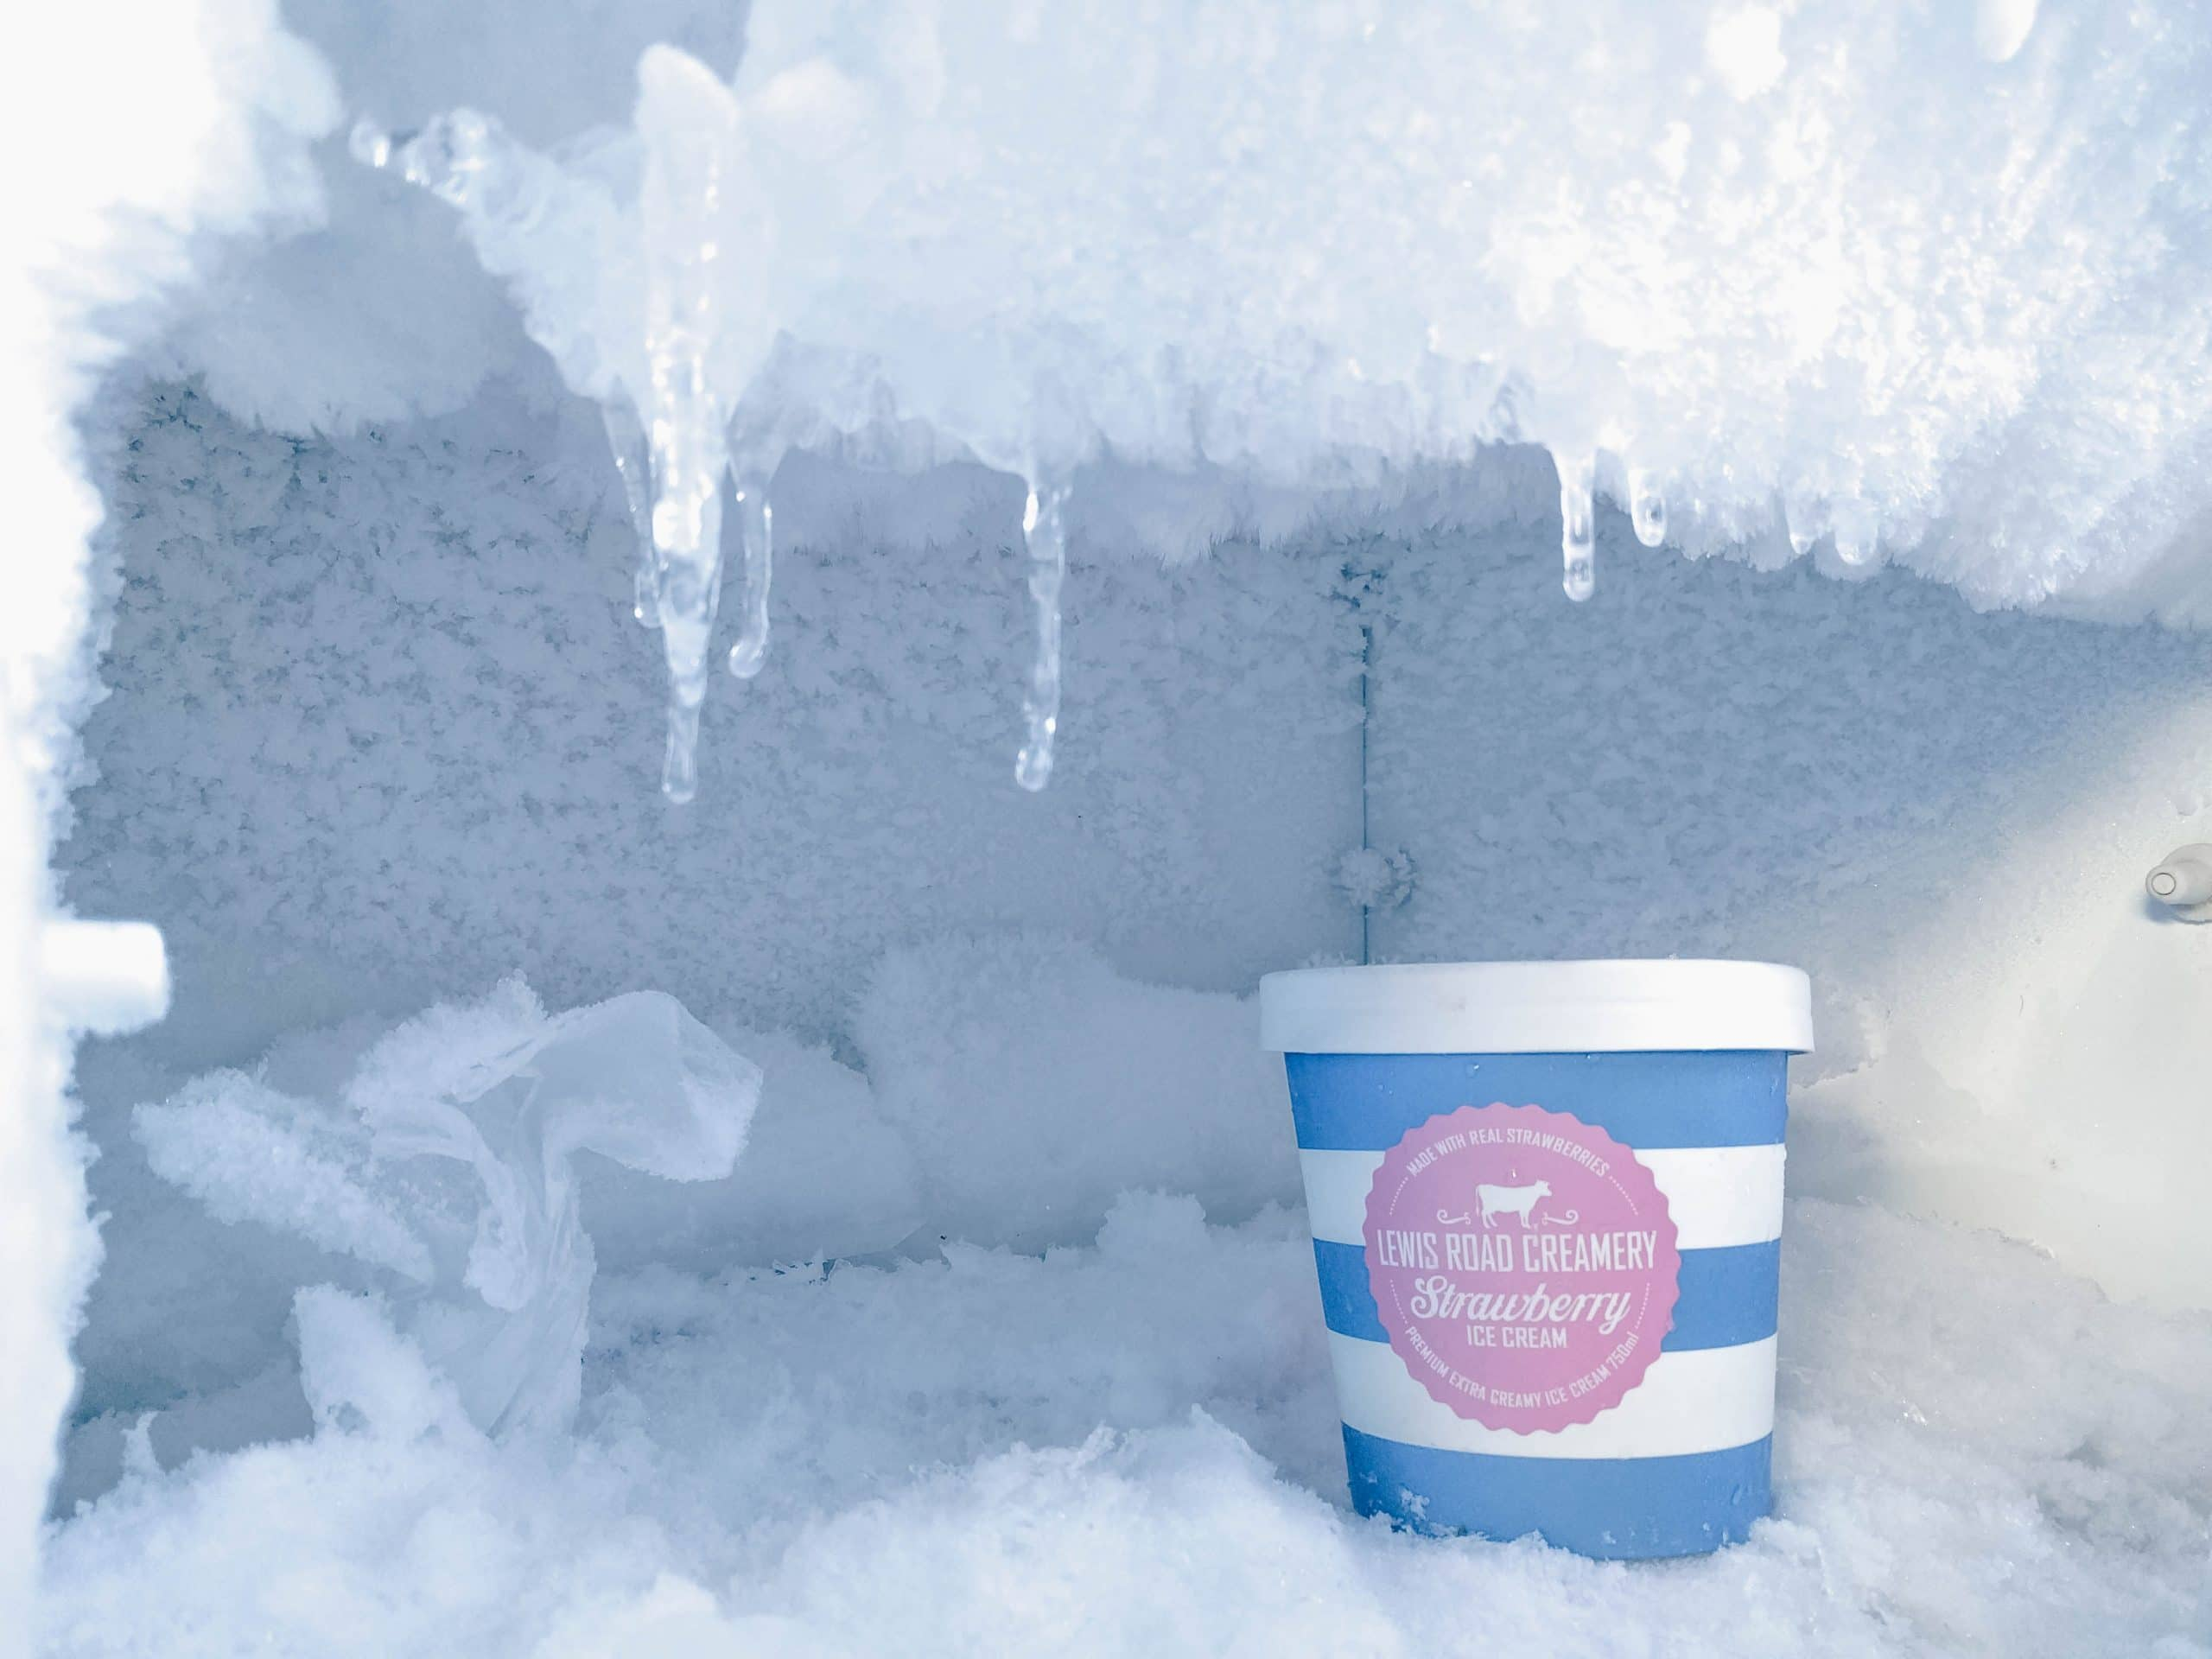 auto-defrost freezer